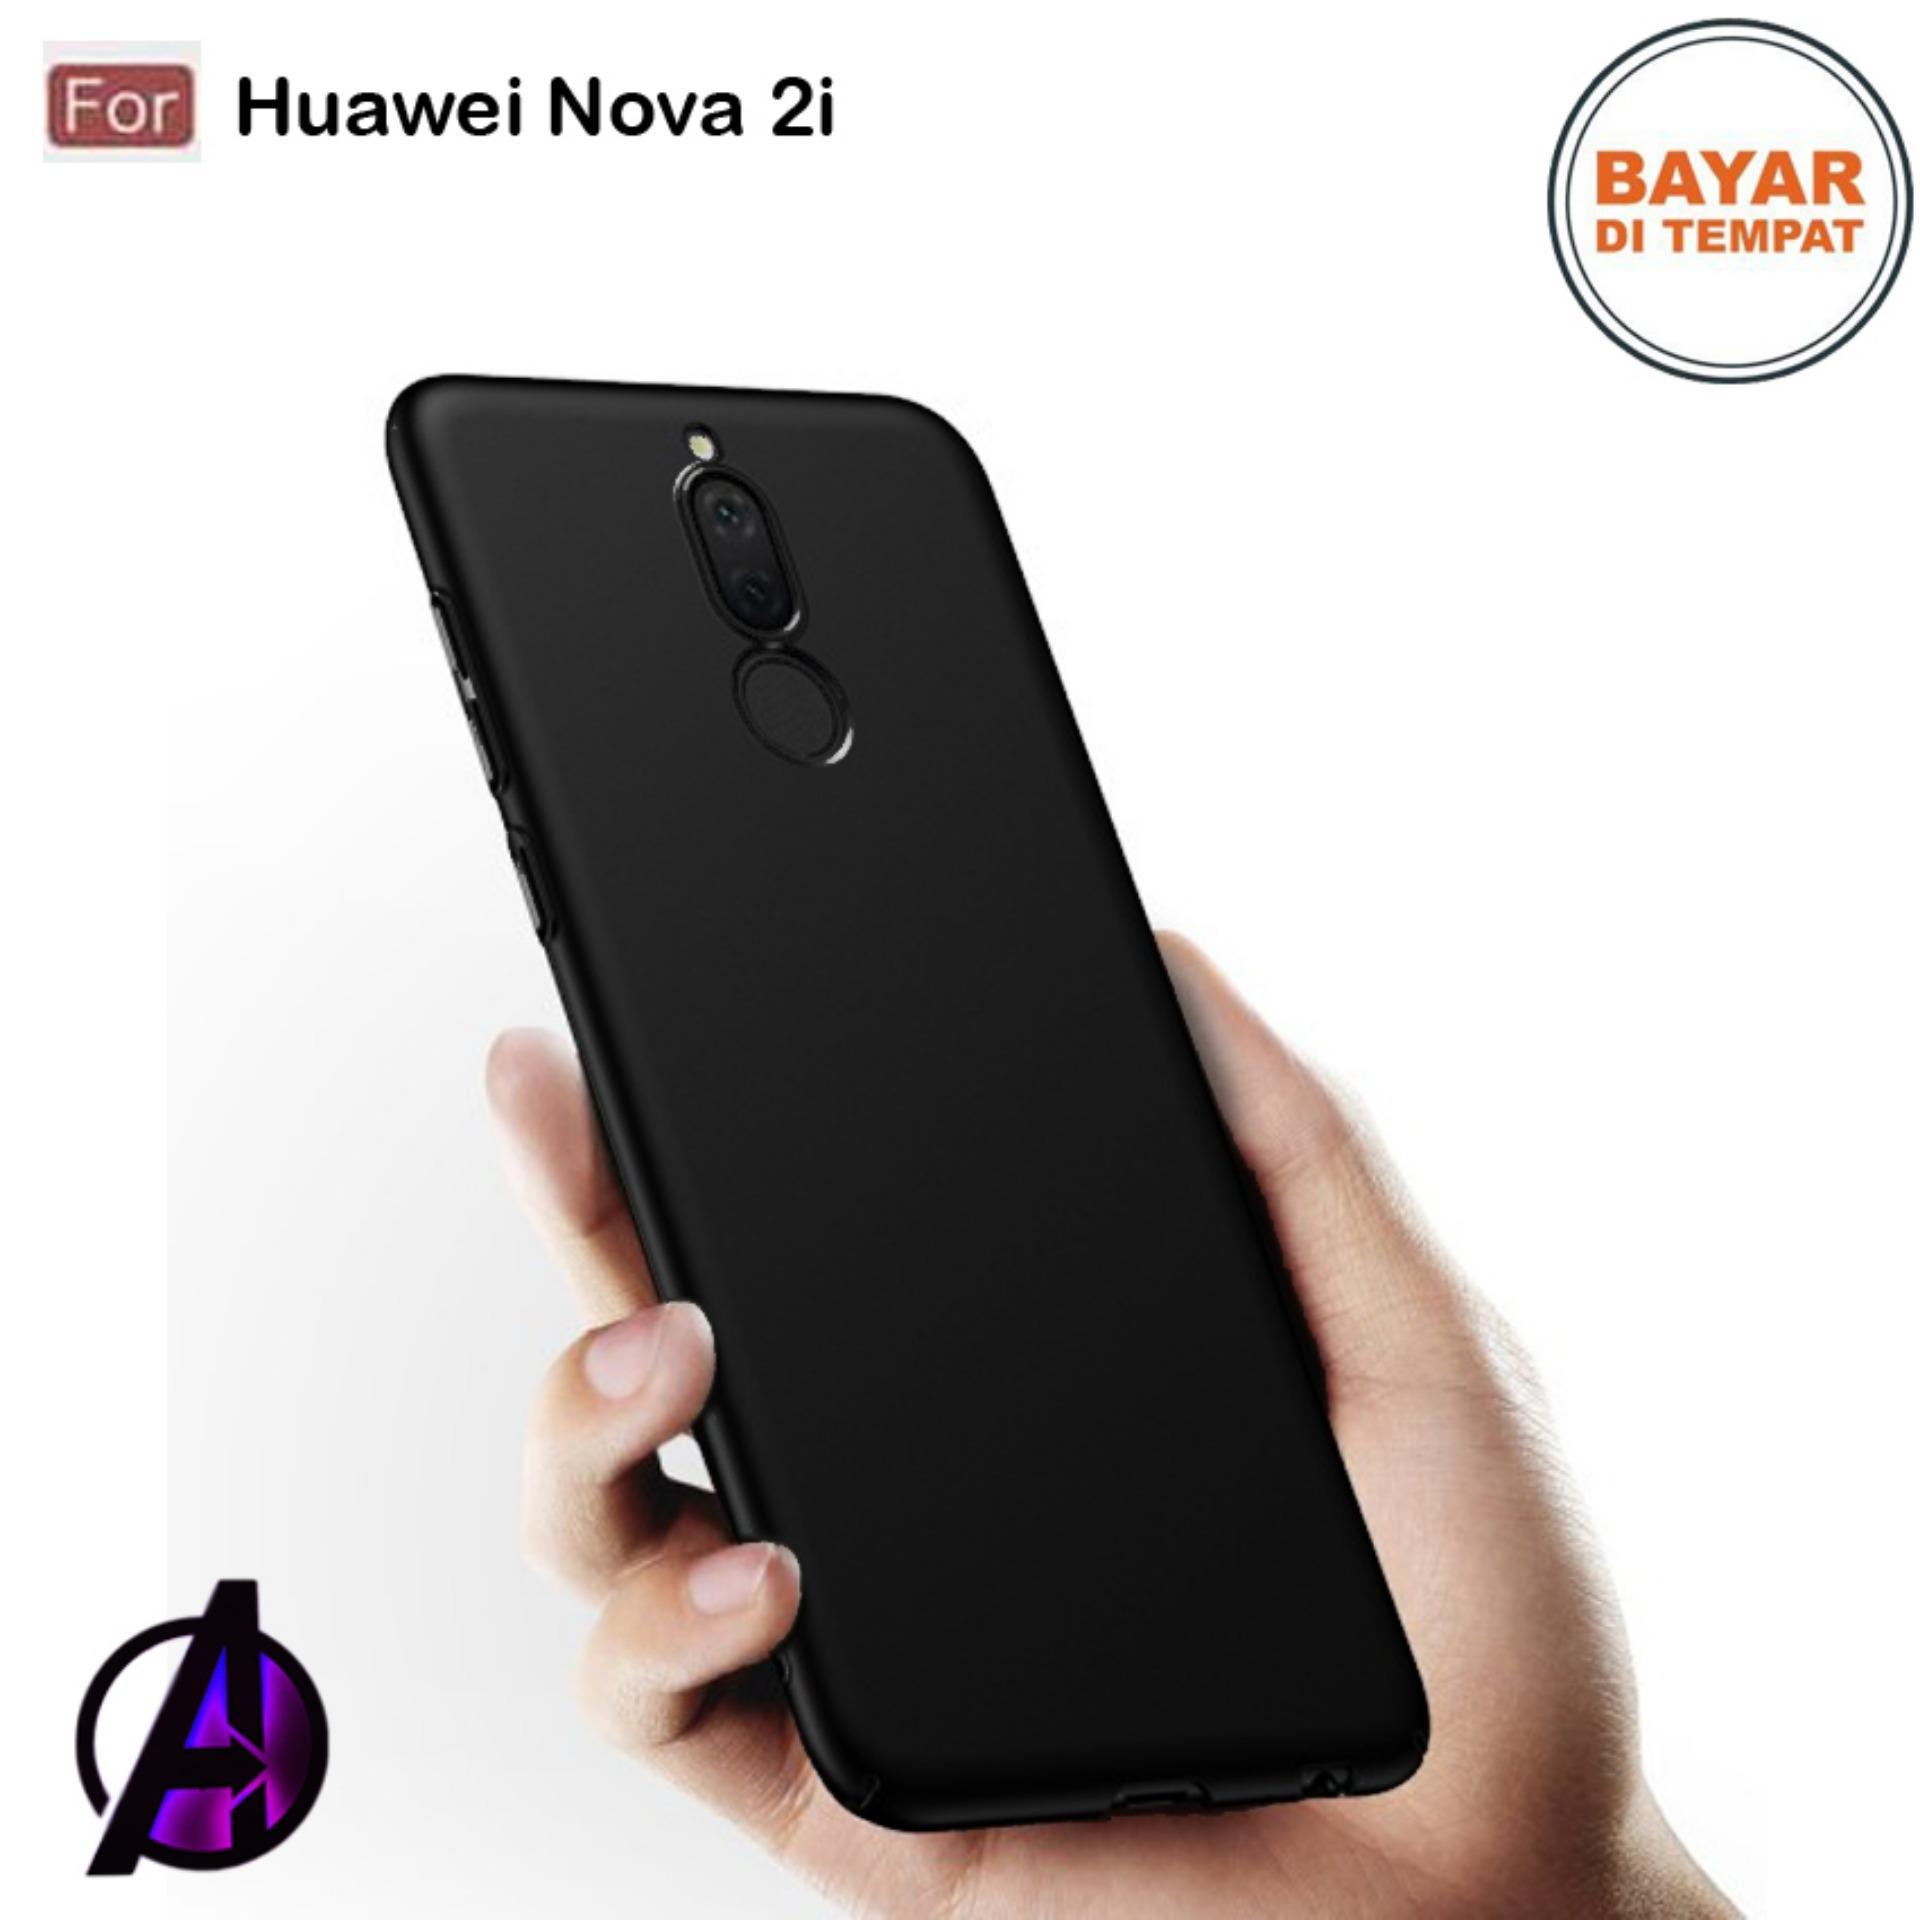 Case Matte Black Soft Slim Casing Handphone Huawei Nova 2i